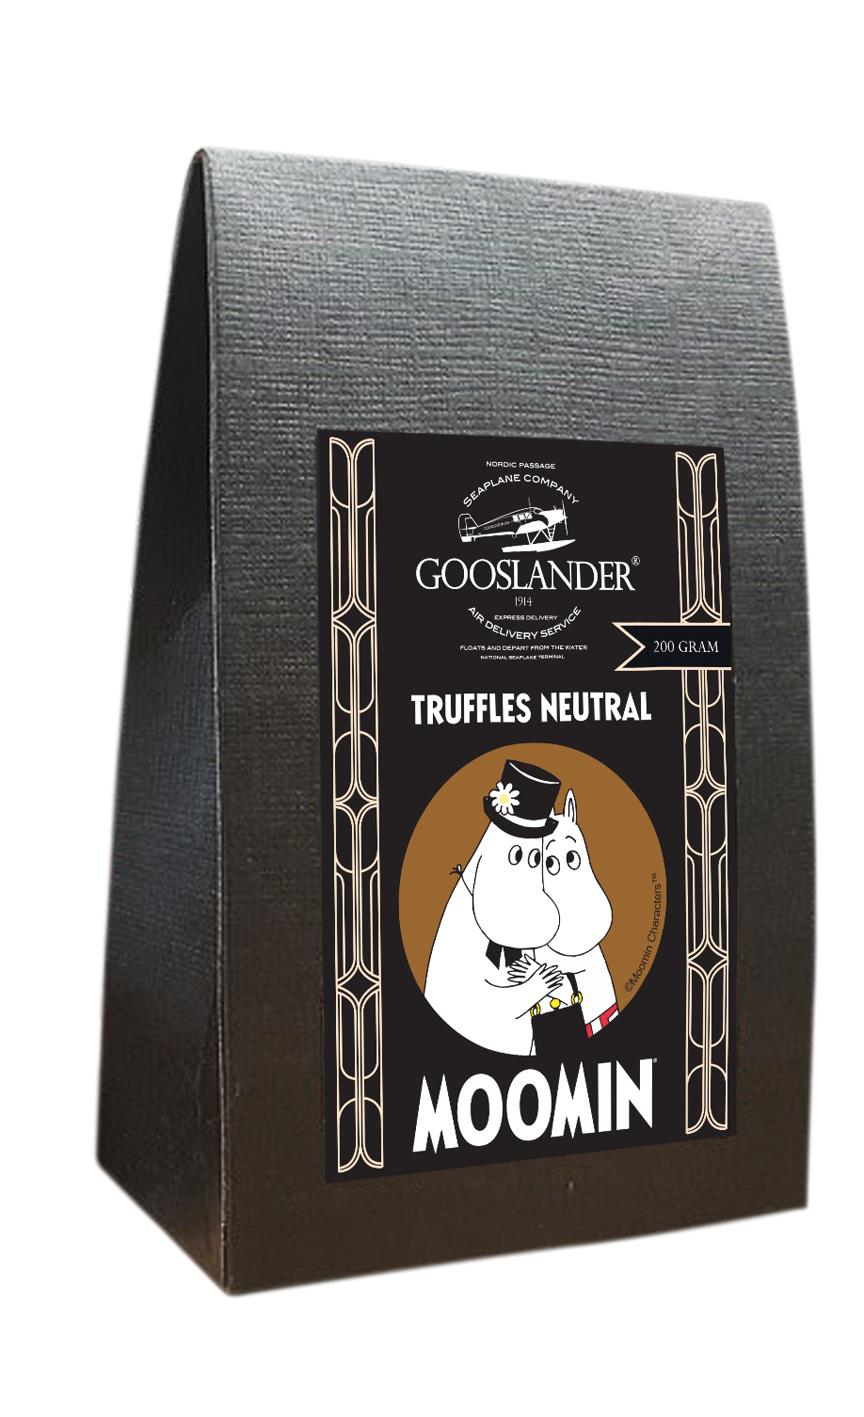 Gooslander Moomin Truffles